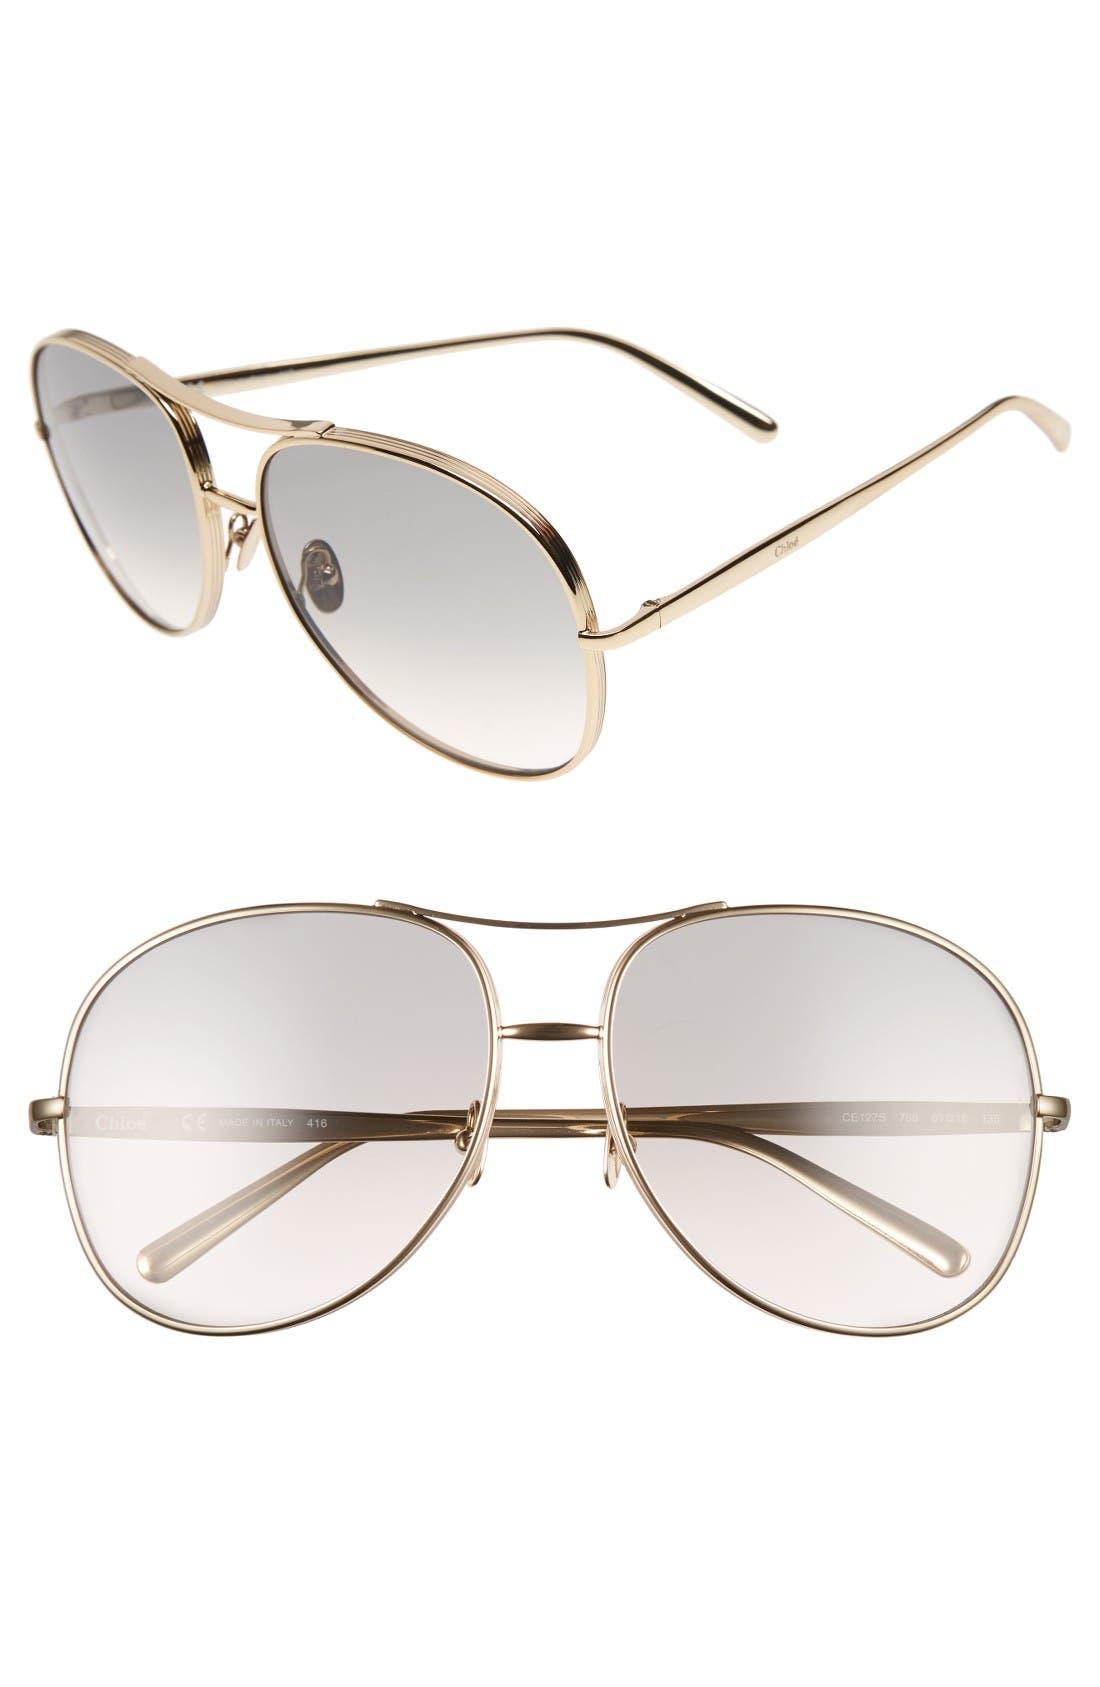 61mm Oversize Sunglasses,                             Main thumbnail 1, color,                             Gold/ Light Grey